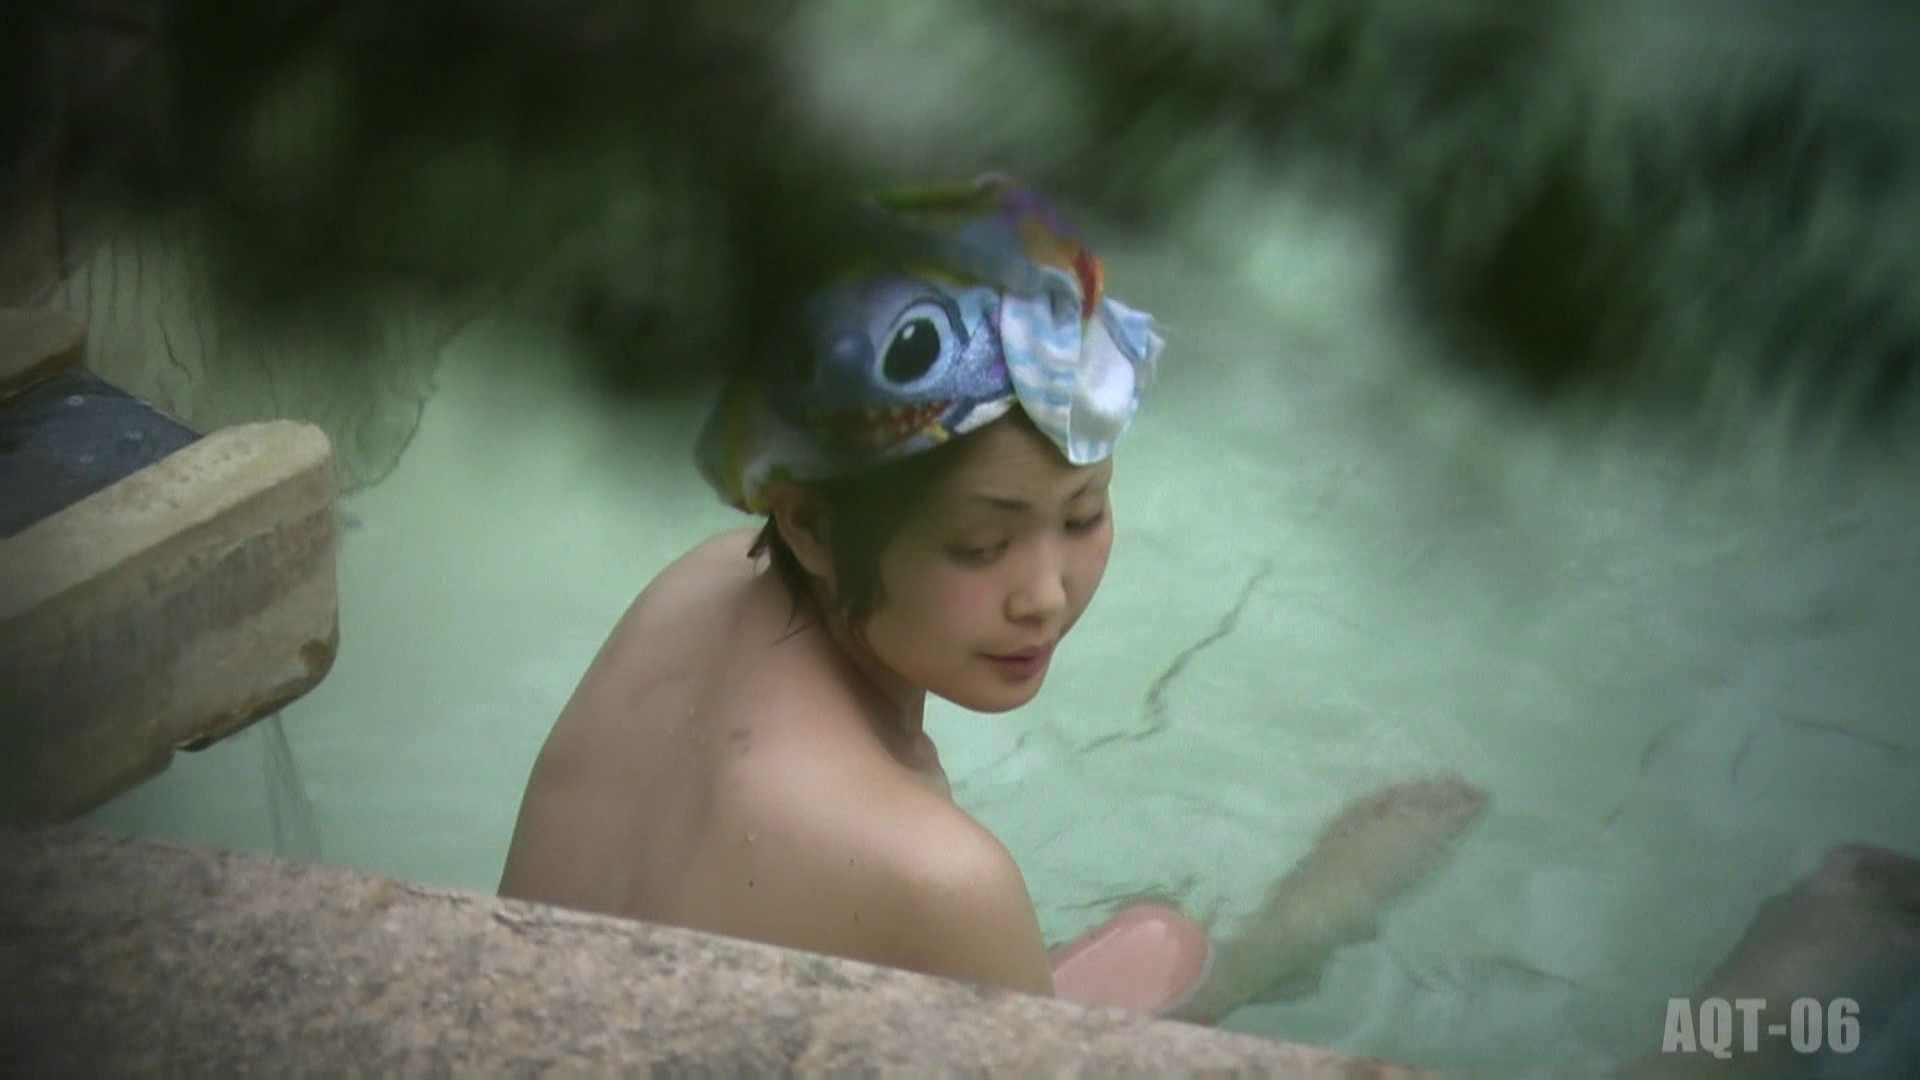 Aquaな露天風呂Vol.761 盗撮映像  84Pix 41